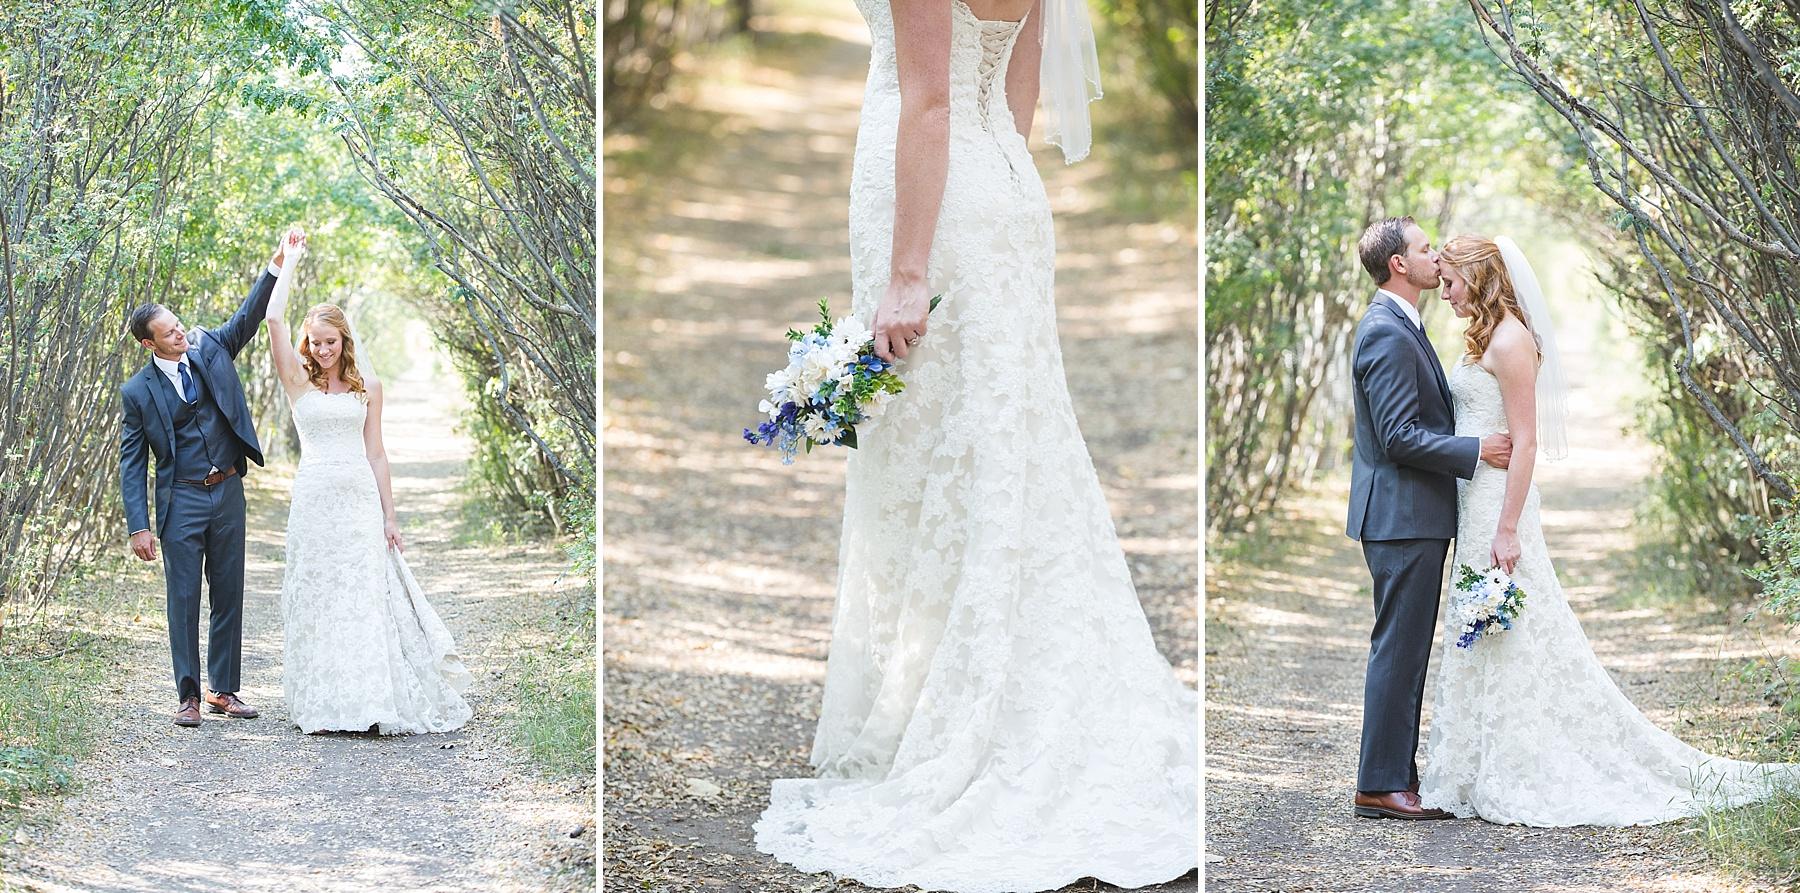 Edworthy Park Wedding Photos